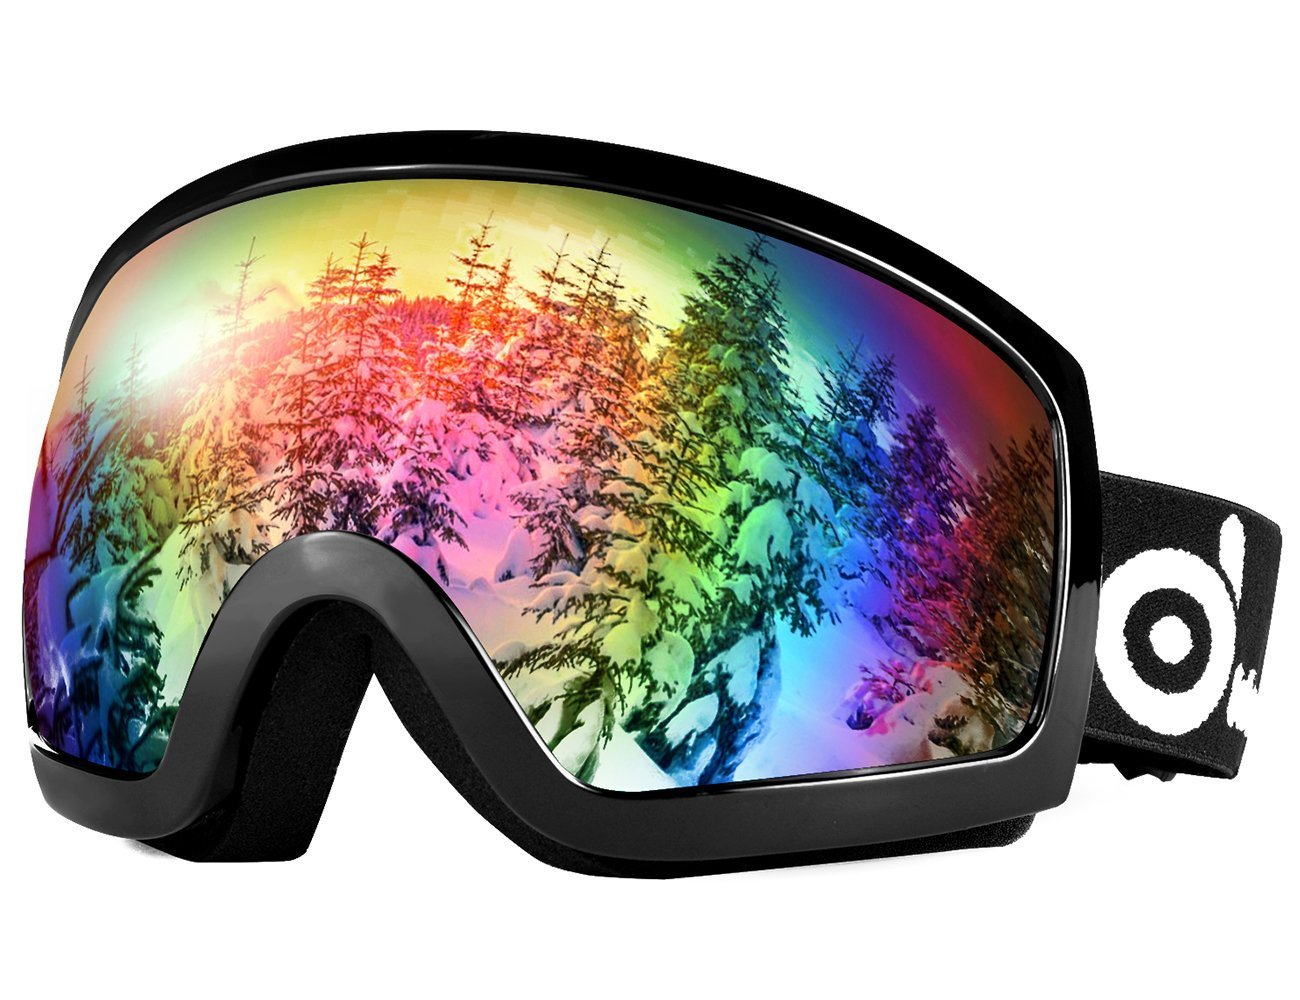 Odoland Snow Ski Goggles S2 Double Lens Anti-Fog Windproof UV400 Eyewear